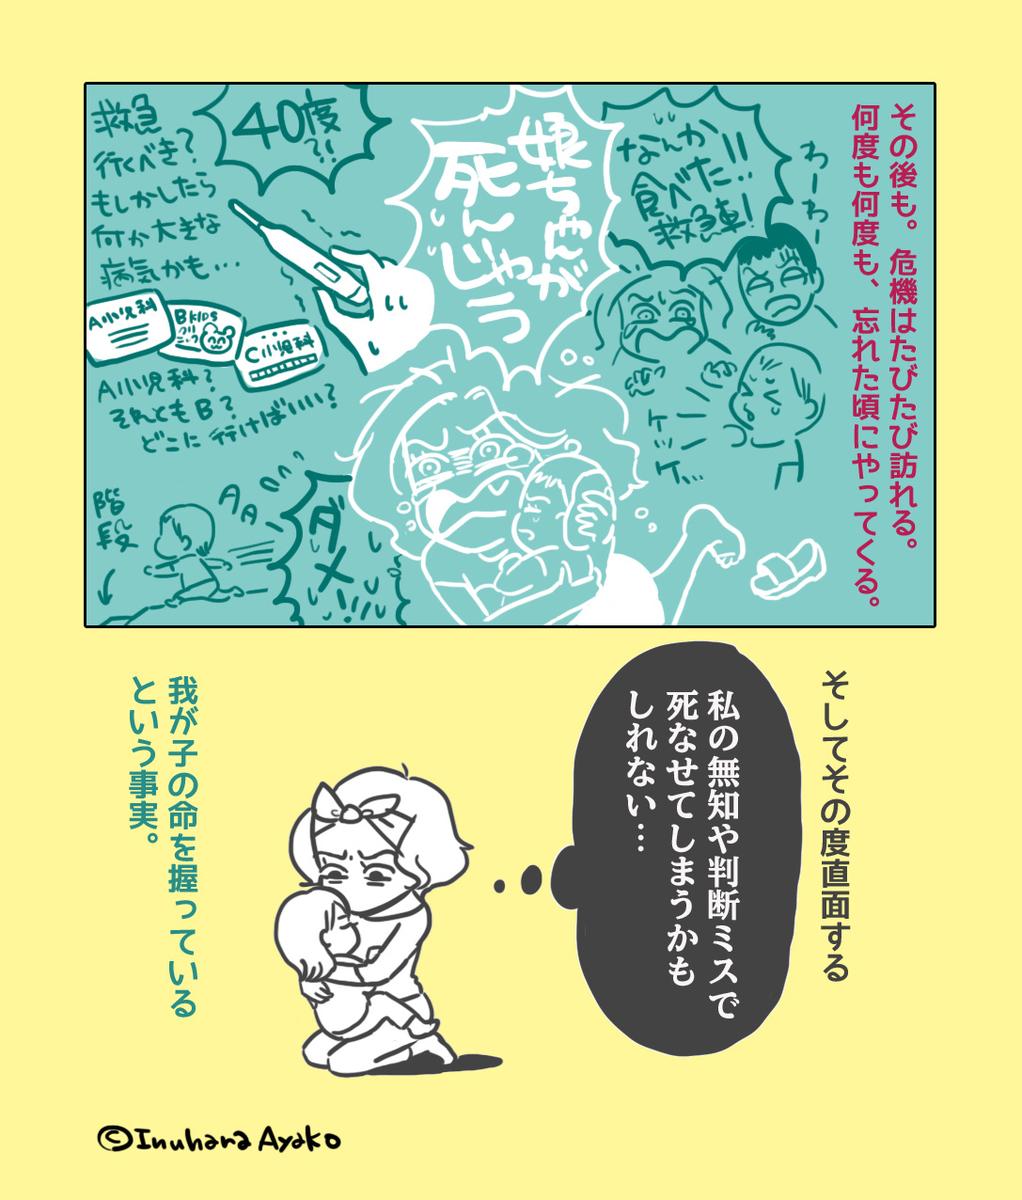 f:id:kaitousyoujyo_haha:20190708163522j:plain